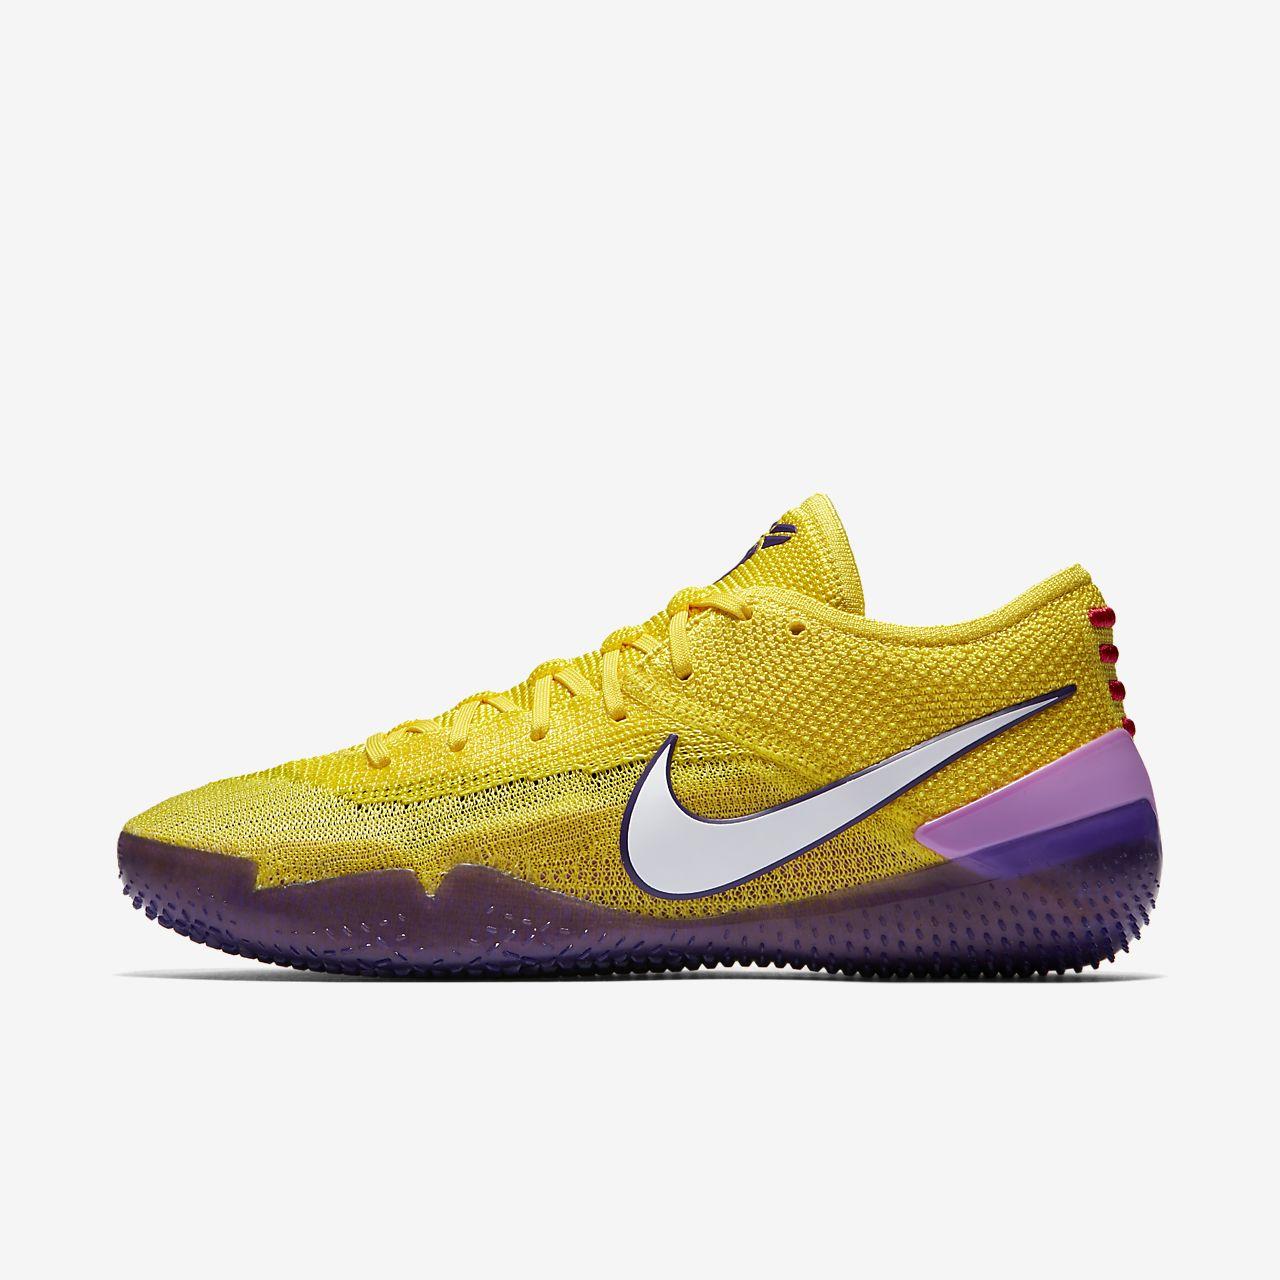 best sneakers e0fbf f62e6 clearance nike kobe a.d. 12 mid genesis white purple 69e5c 7d566  where can  i buy kobe a.d. nxt 360 zapatillas de baloncesto 73468 3ac75